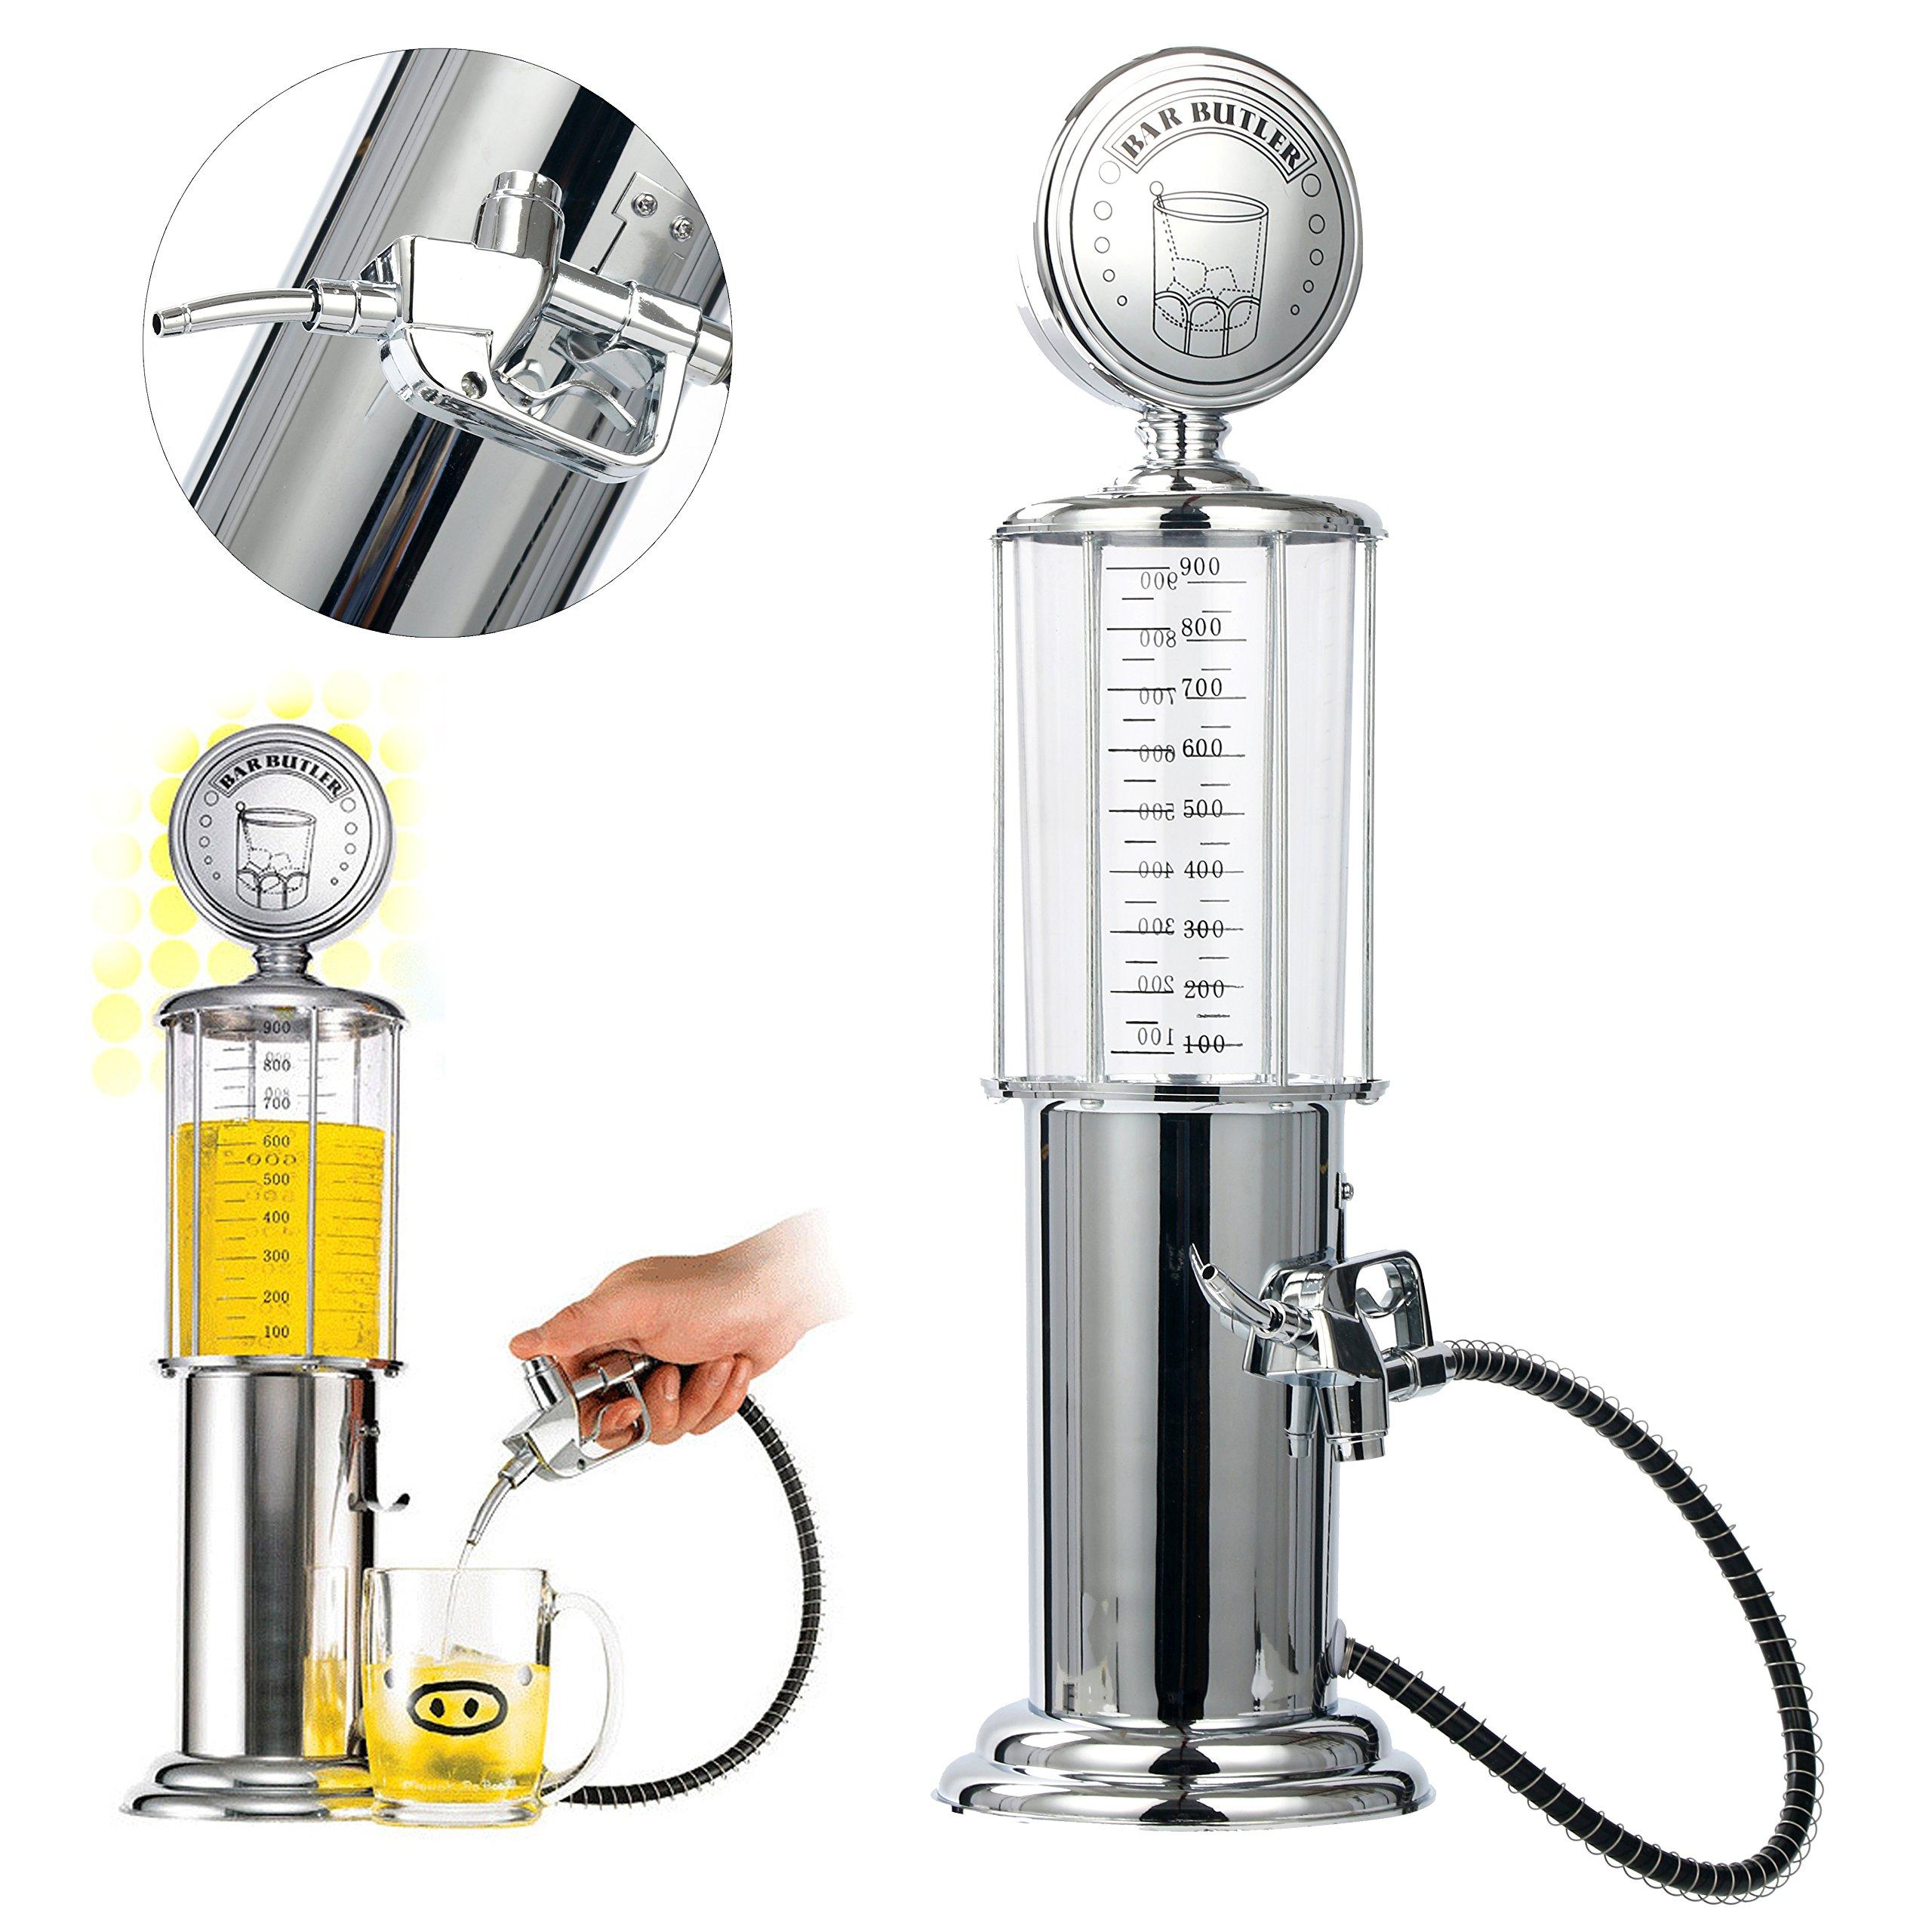 YaeBrew Gas Pump Liquor Dispenser - Gun Barware Mini Beer Pourer Water Liquid Bar Drinking Alcohol Dispenser Wine Pump Dispenser Machine - Whiskey / Bourbon Decanter (Single Gun) by YaeBrew